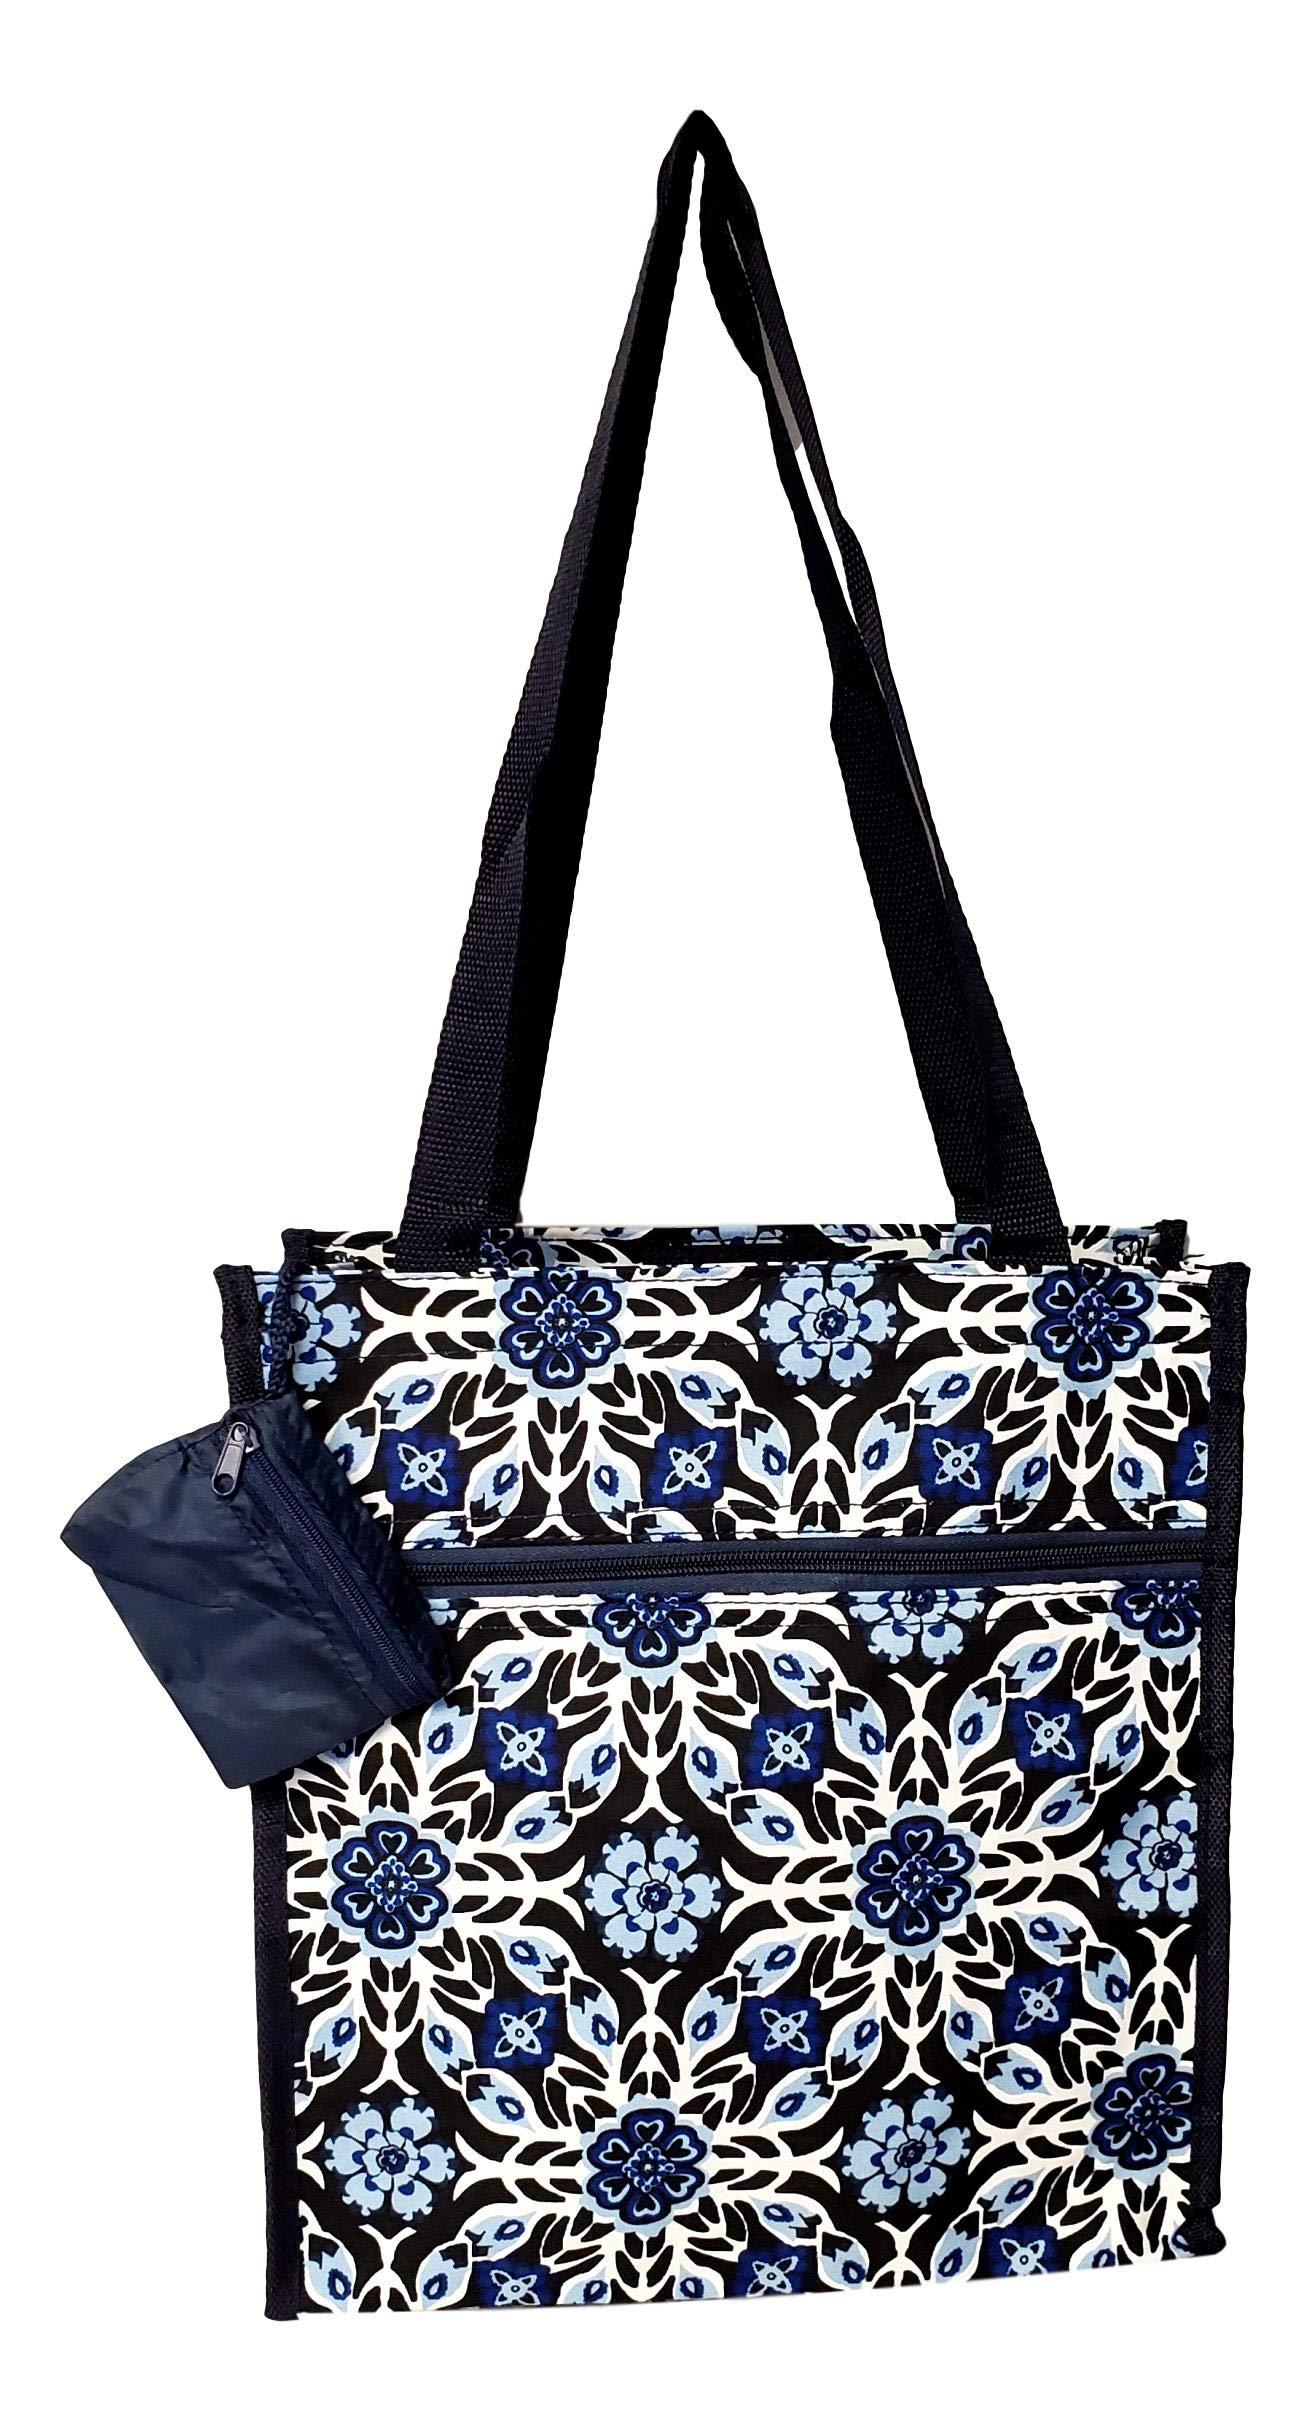 12 in by 13 in Tote Bag w/Mesh Water Bottle Pocket (Blue Flower Geo)